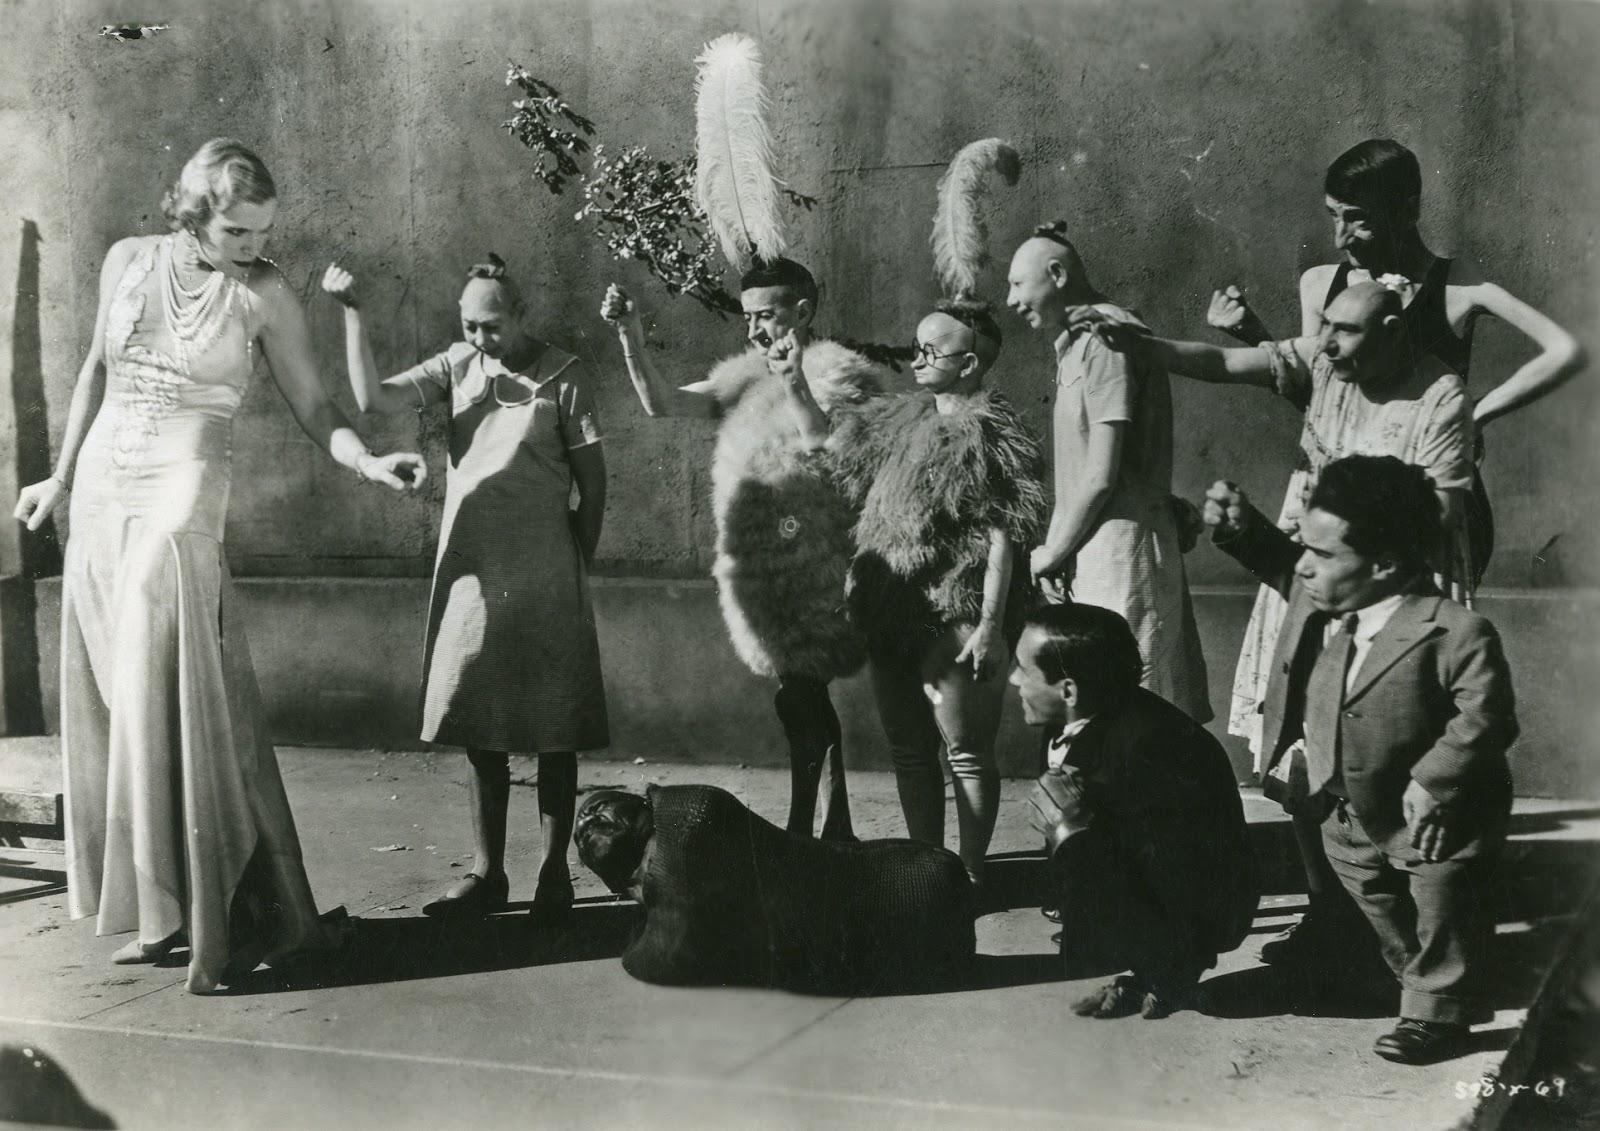 7. Monstros (1932)